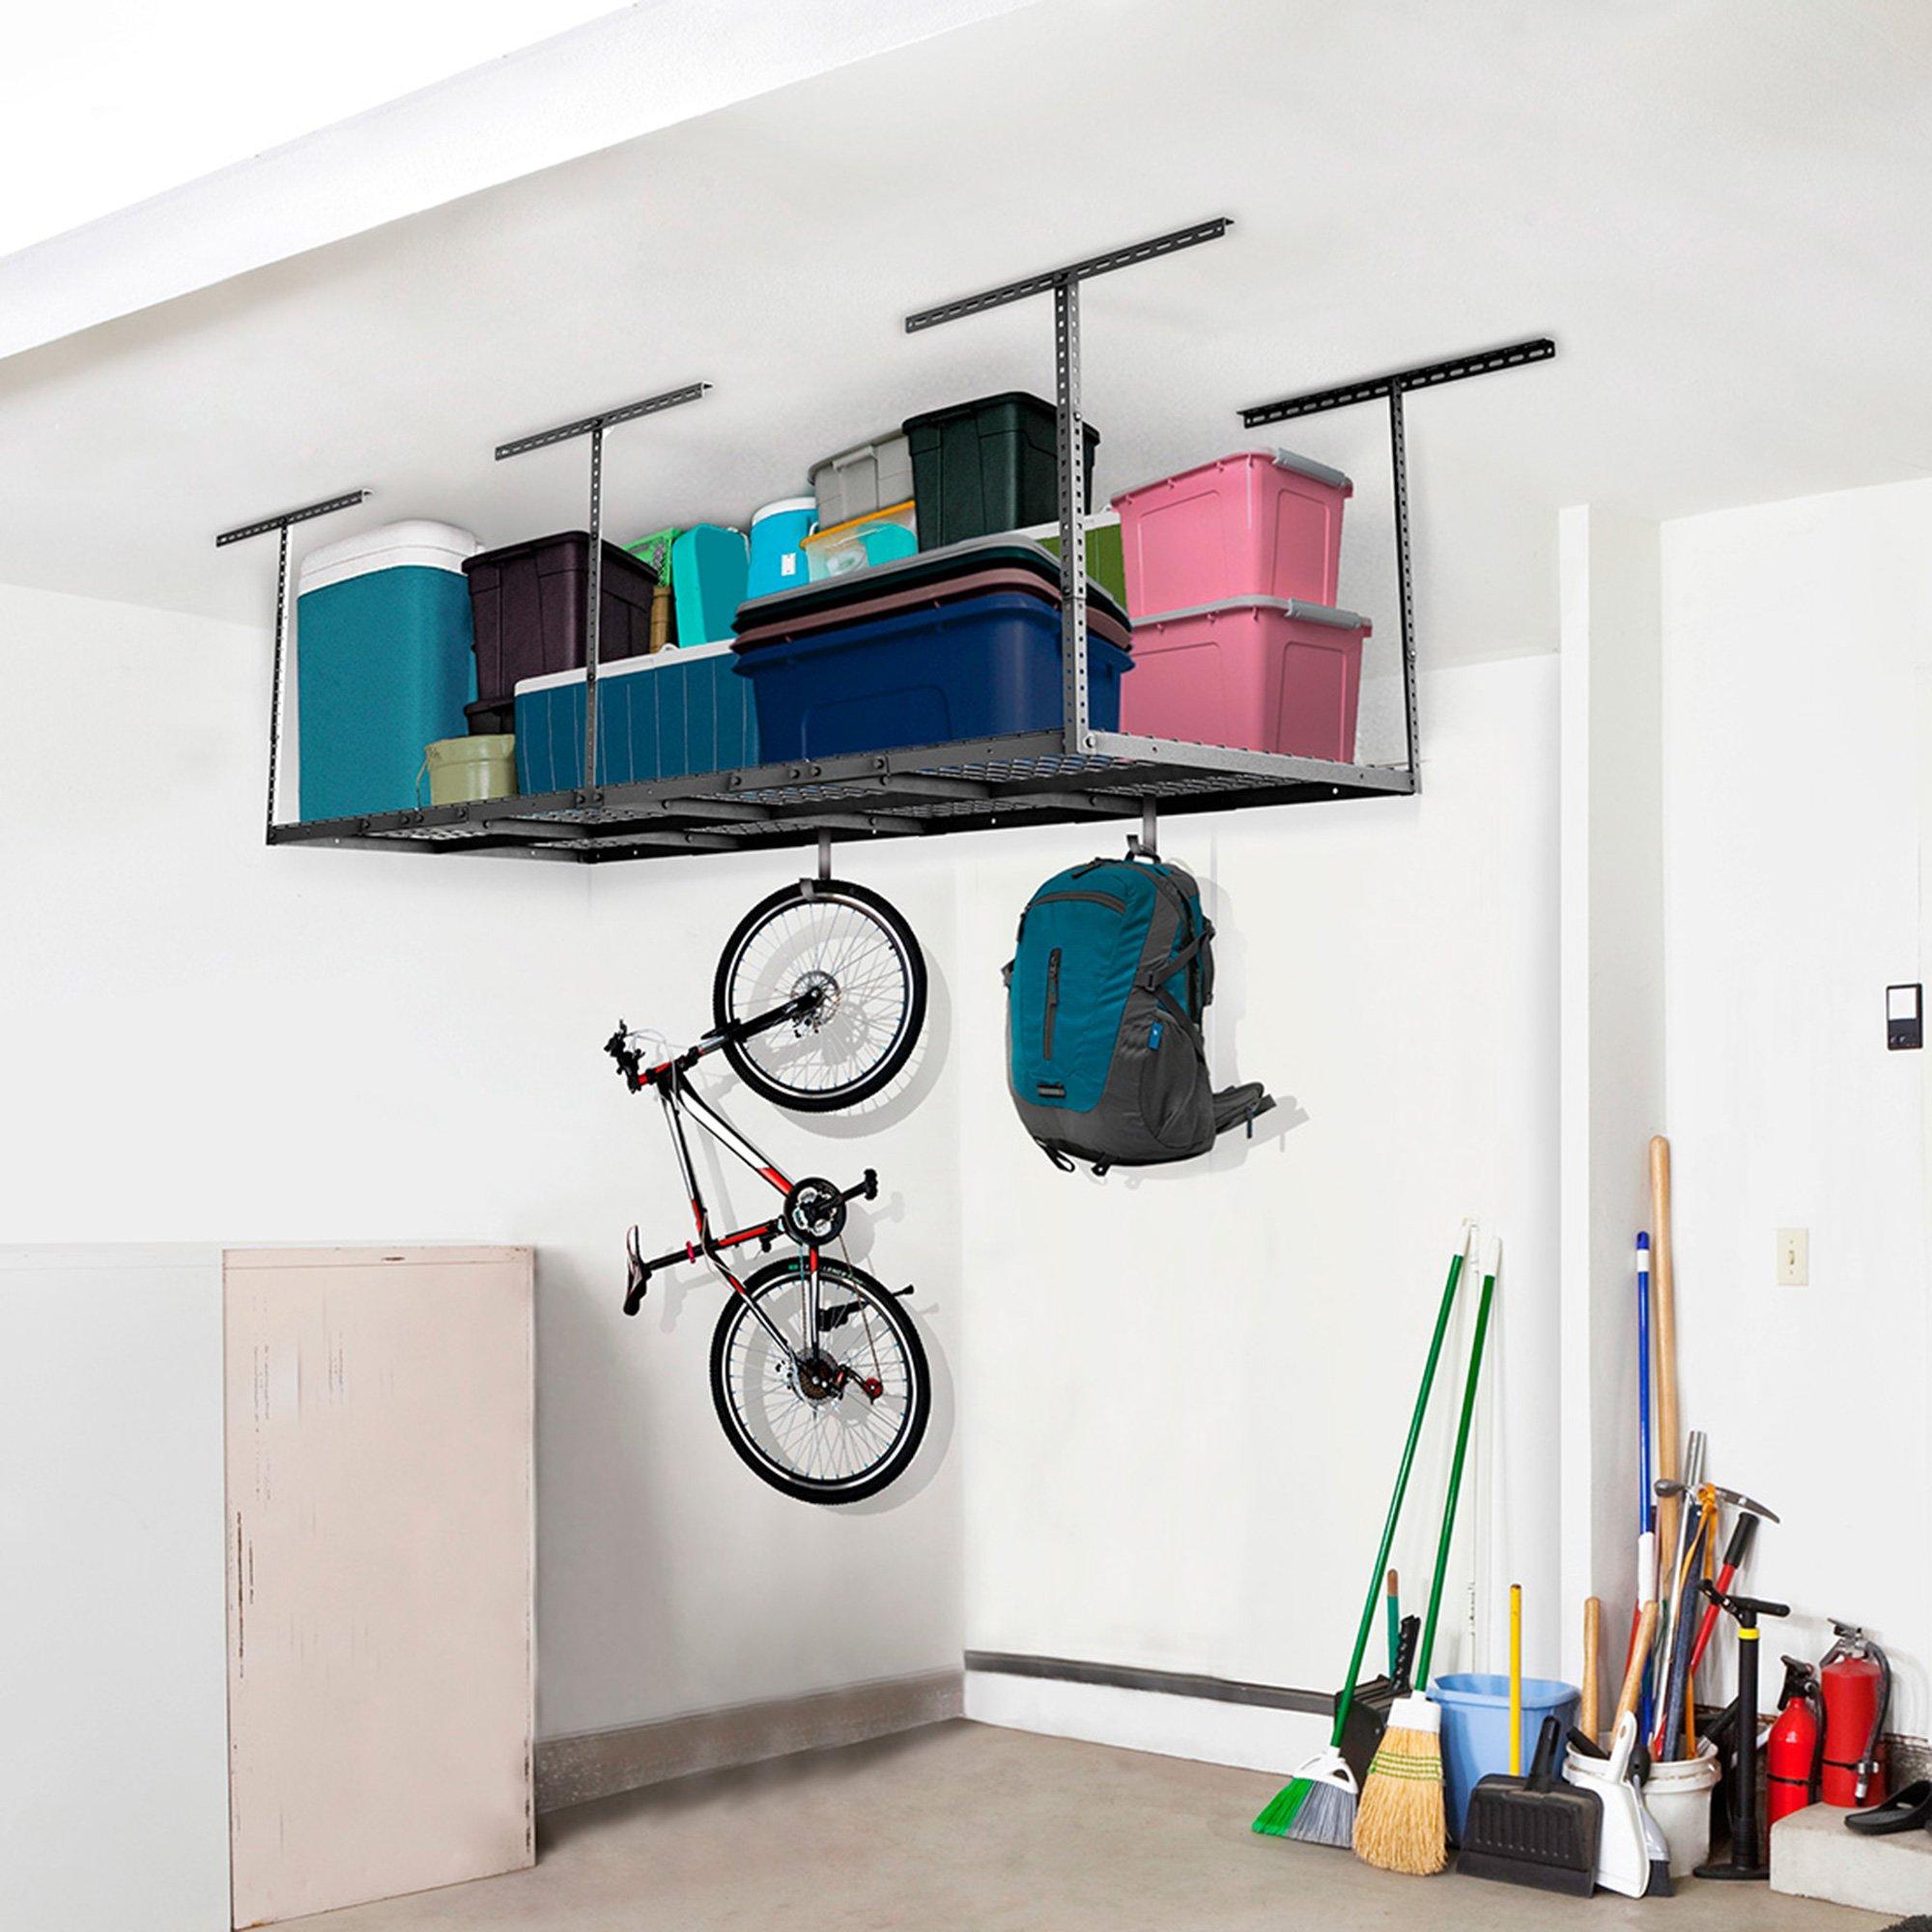 FLEXIMOUNTS 3x8 Overhead Garage Storage Rack Adjustable Ceiling Storage Rack Heavy Duty, 96'' Length x 36'' Width x 40'' Height (Black)